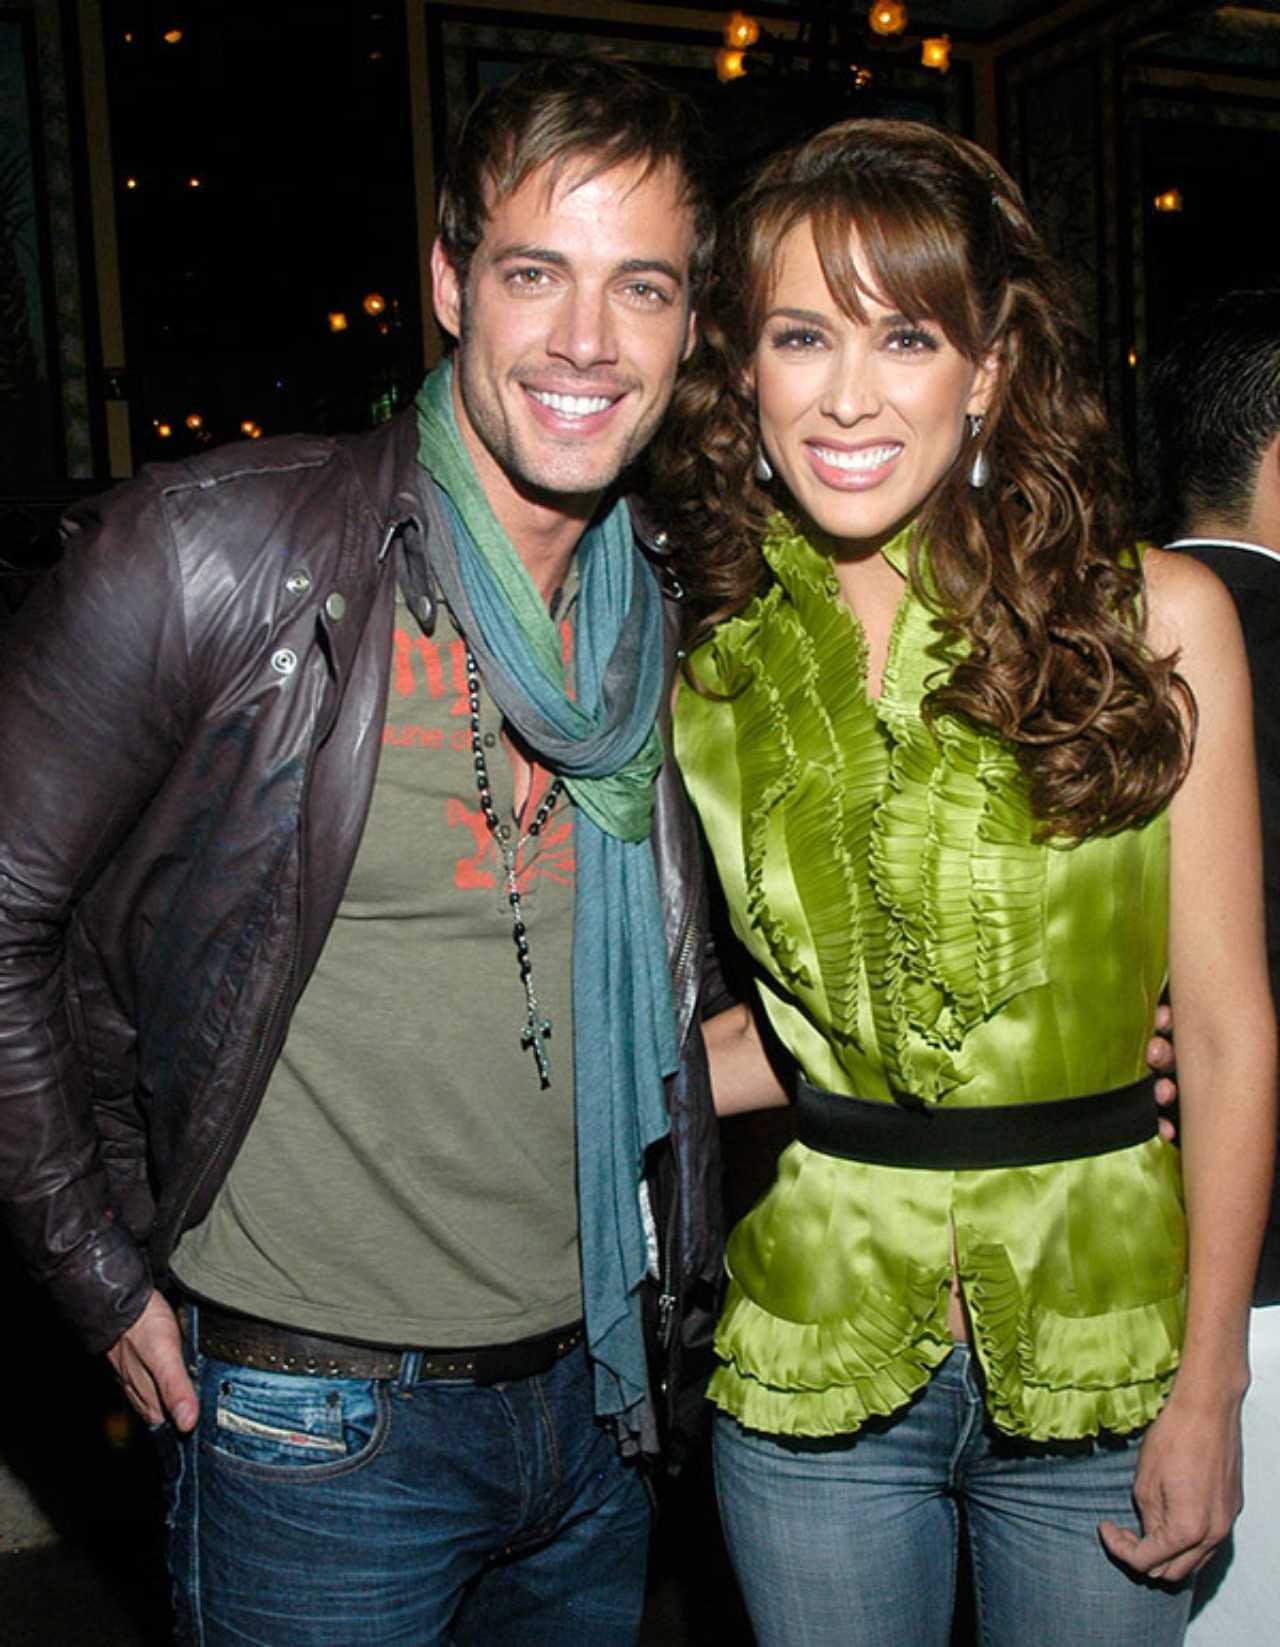 William Levy y Jacqueline Bracamontes